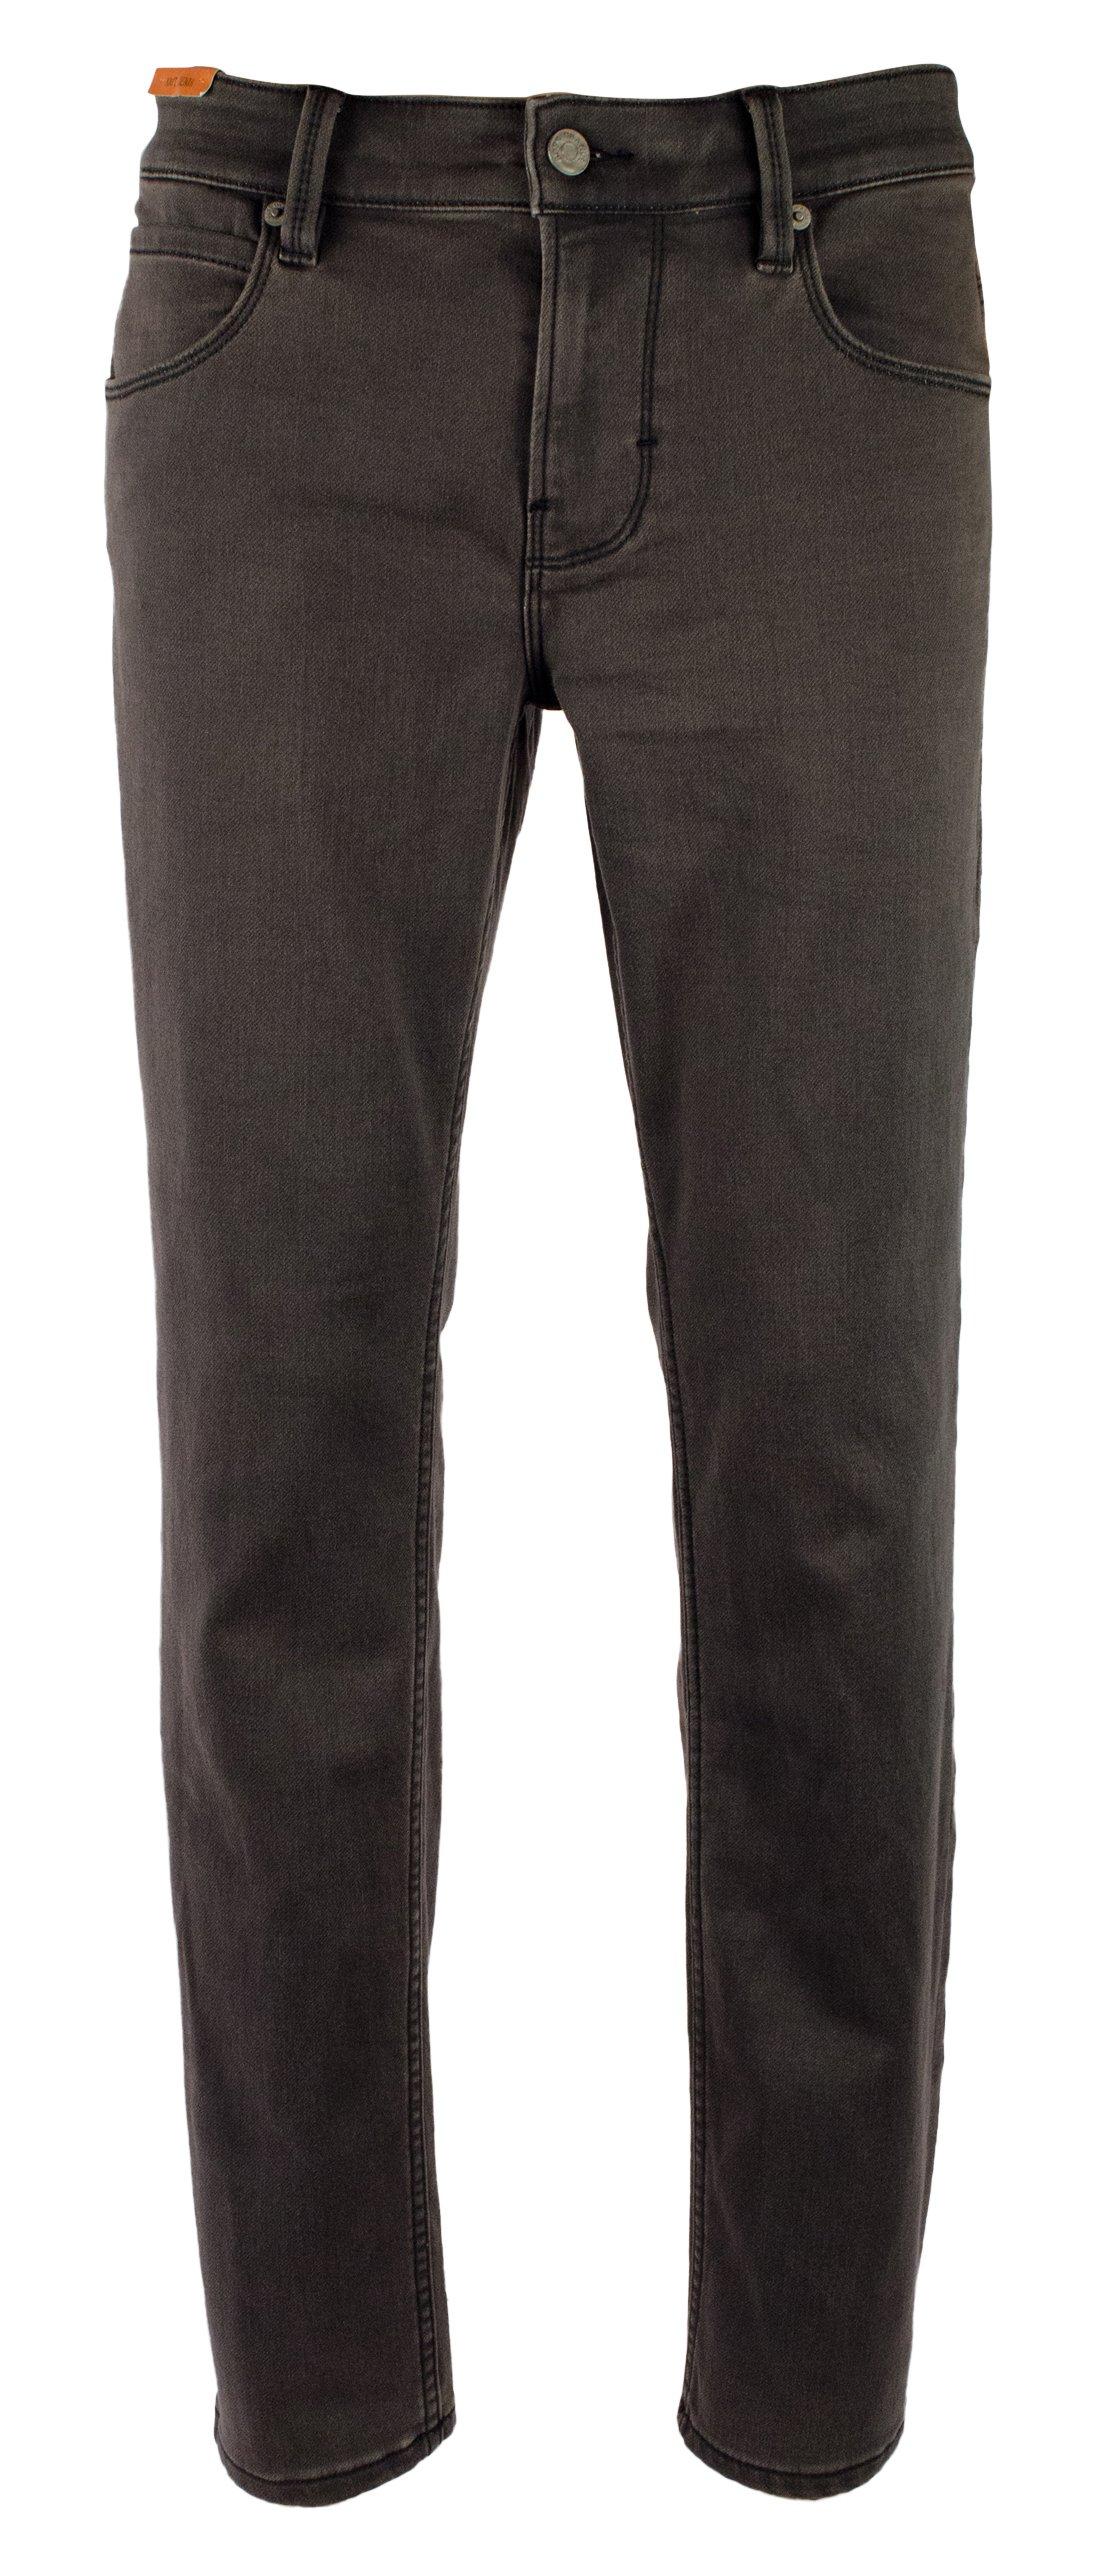 Hugo Boss Men's Orange Label Modern Stretch Slim Fit Knit Denim Jeans-C-38Wx32L by HUGO BOSS